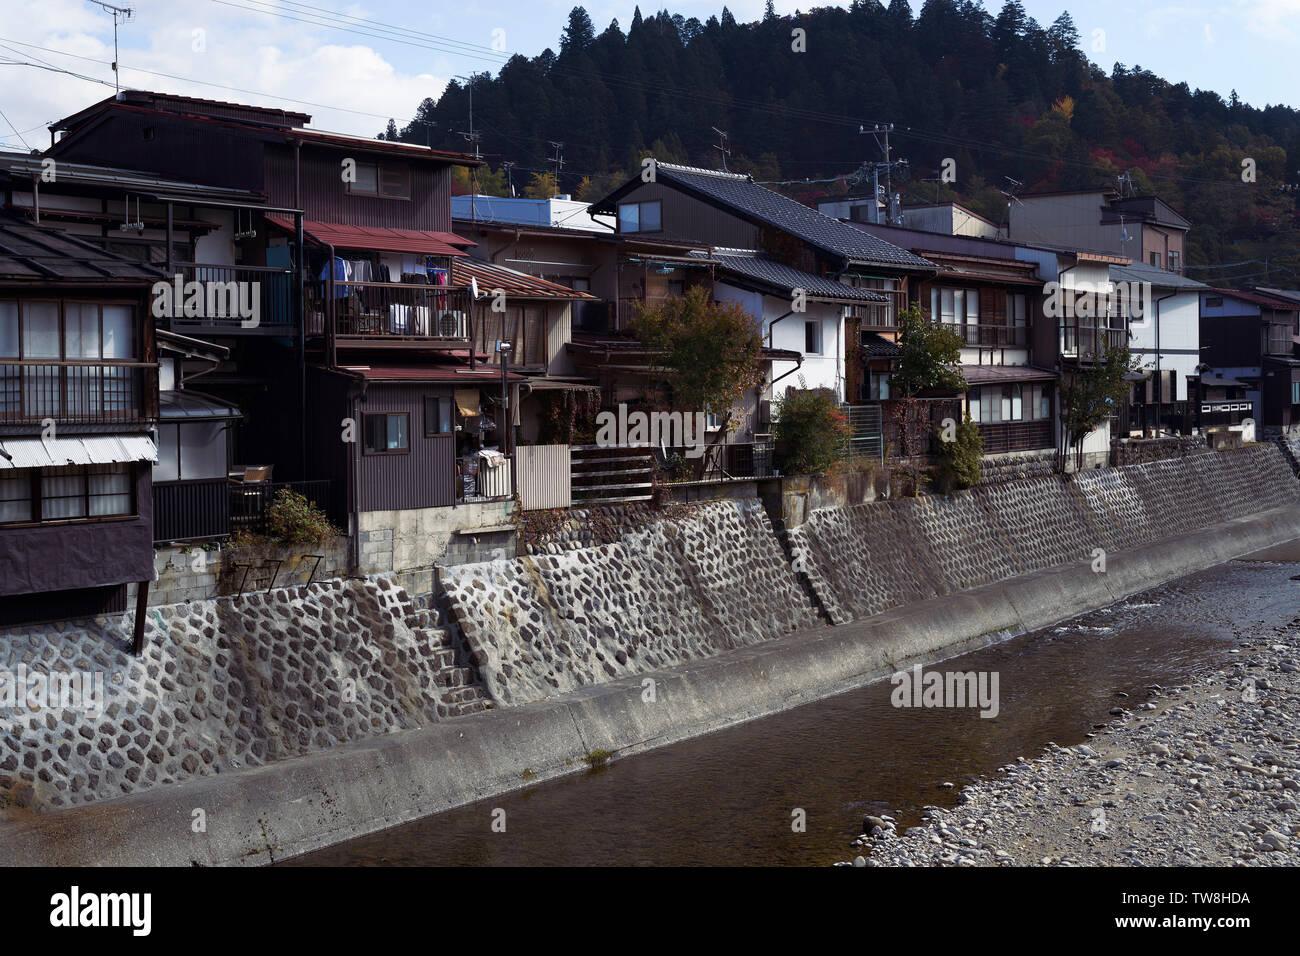 Houses on a bank of Miyagawa river, Takayama city scenery. Hida-Takayama, Gifu prefecture, Japan 2018. - Stock Image